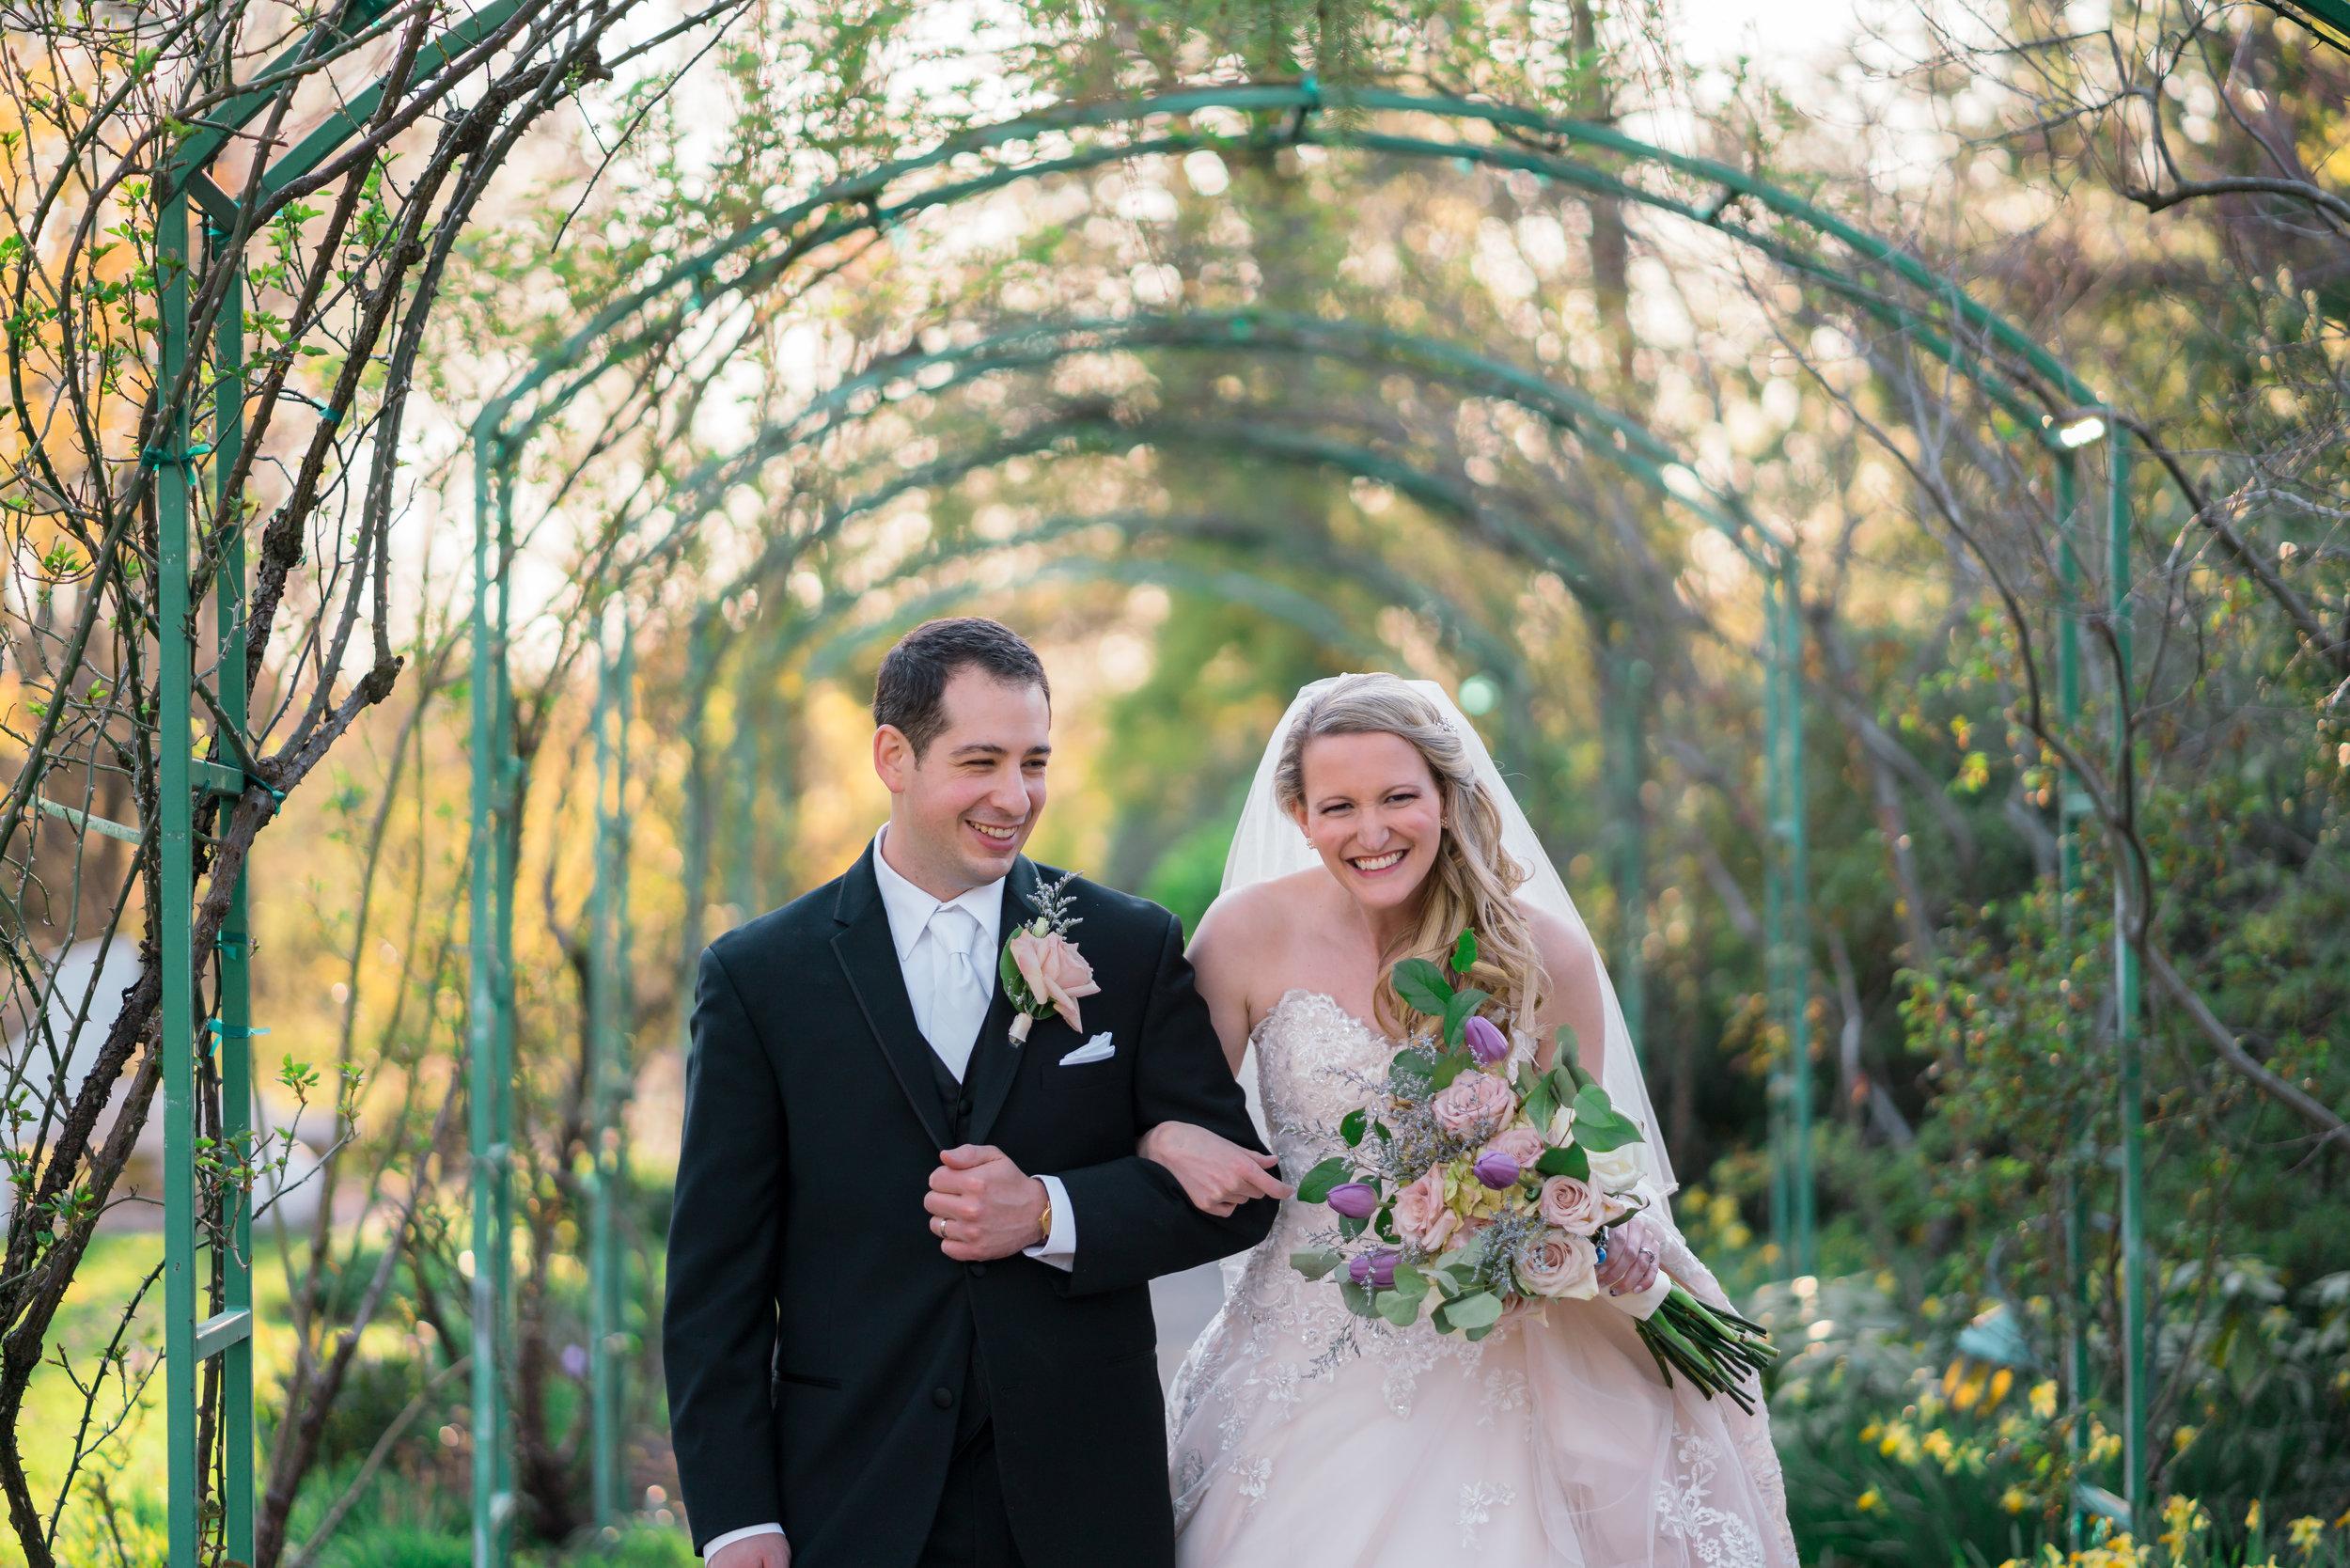 Marielle.Christopher.Wedding.247.jpg